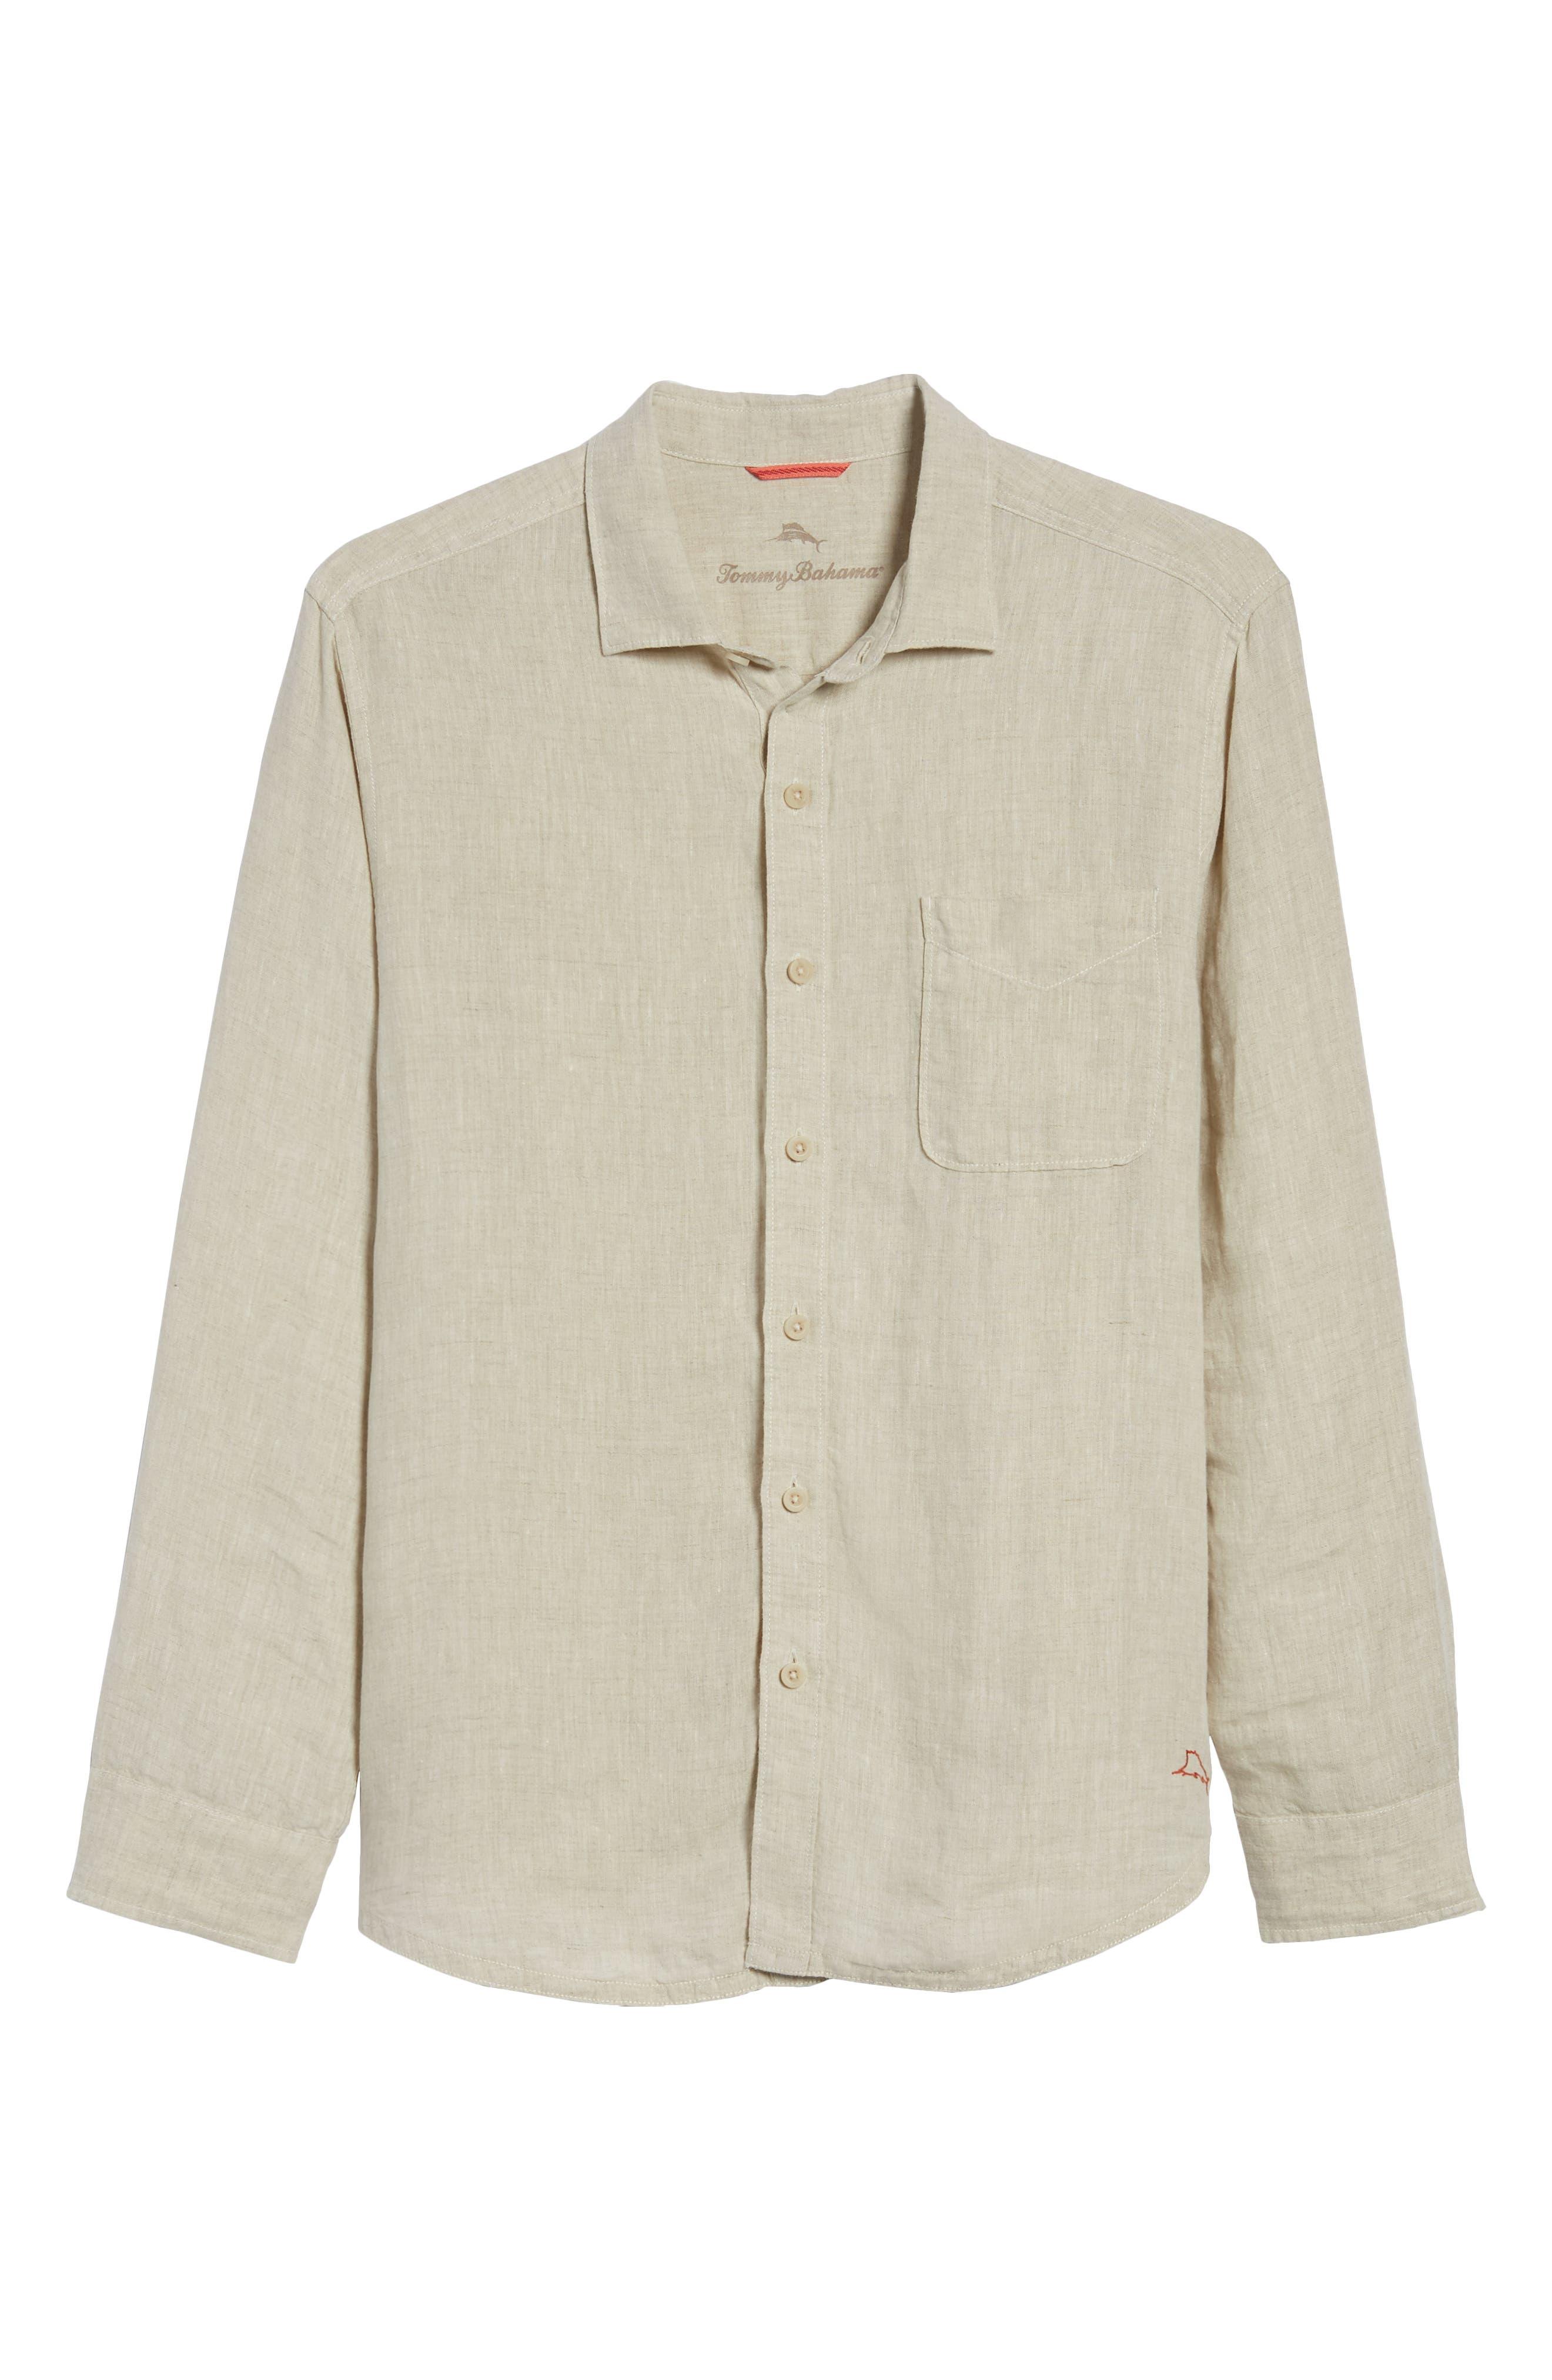 Seaspray Breezer Linen Shirt,                             Alternate thumbnail 22, color,